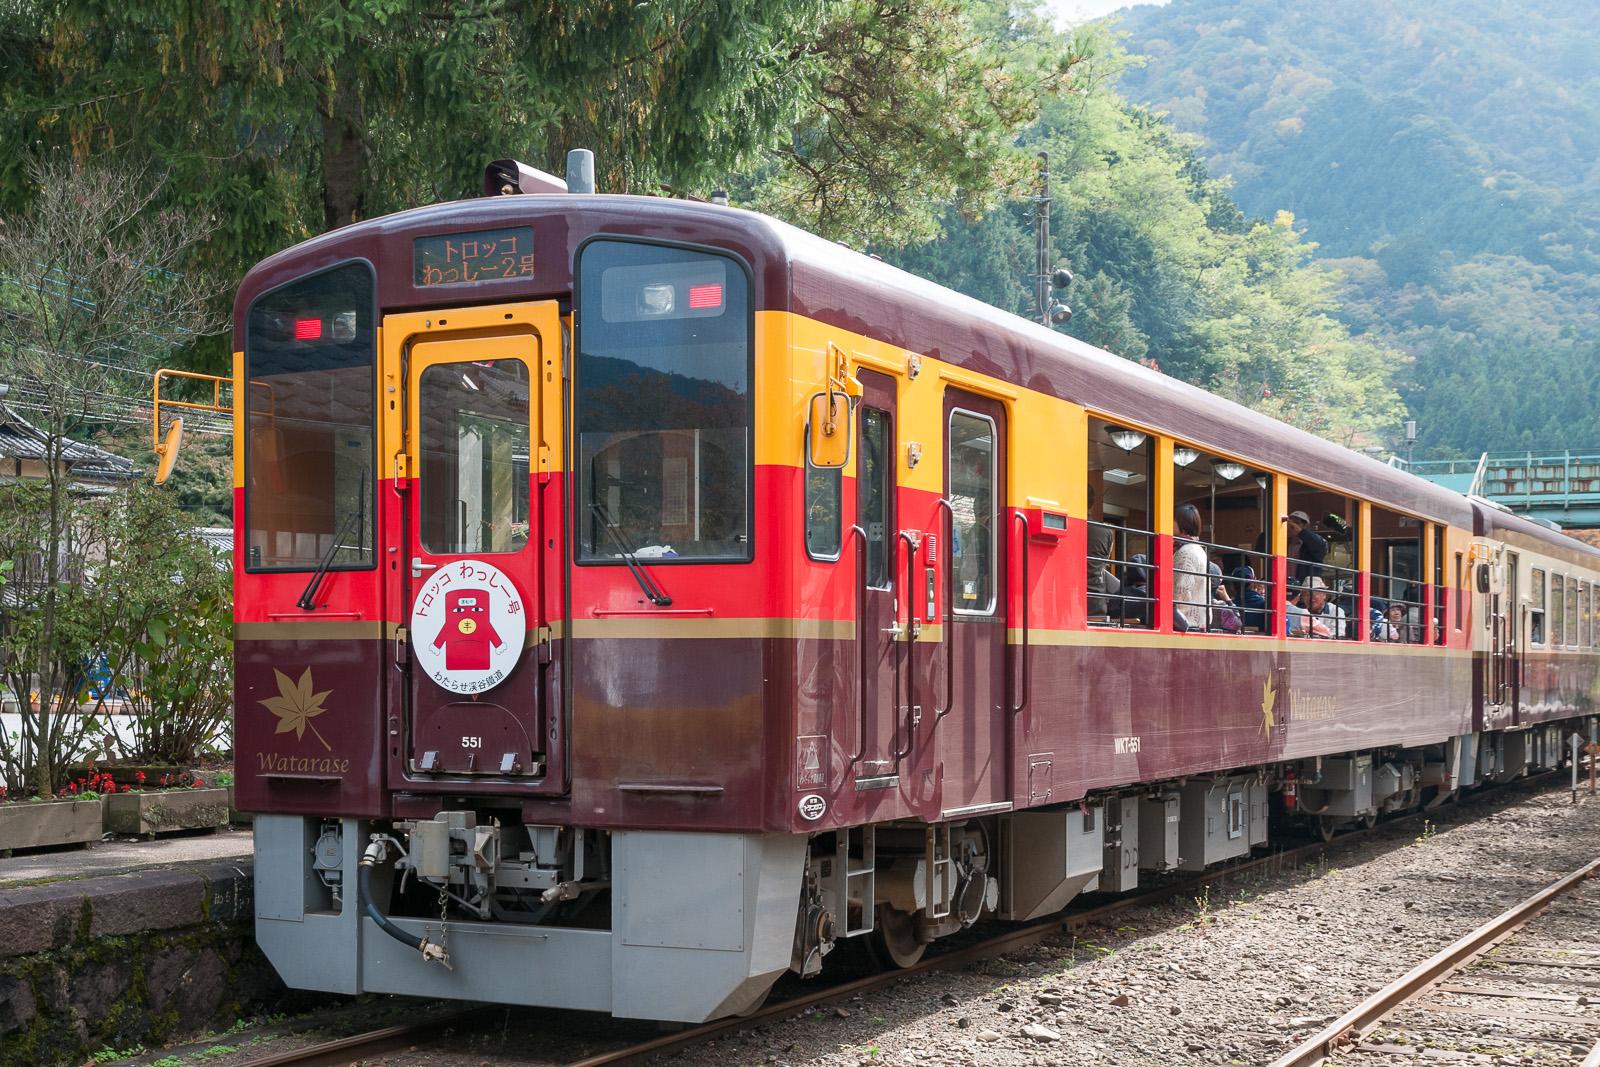 https://upload.wikimedia.org/wikipedia/commons/f/fb/Watarase-Keikoku-Railway-WKT551.jpg